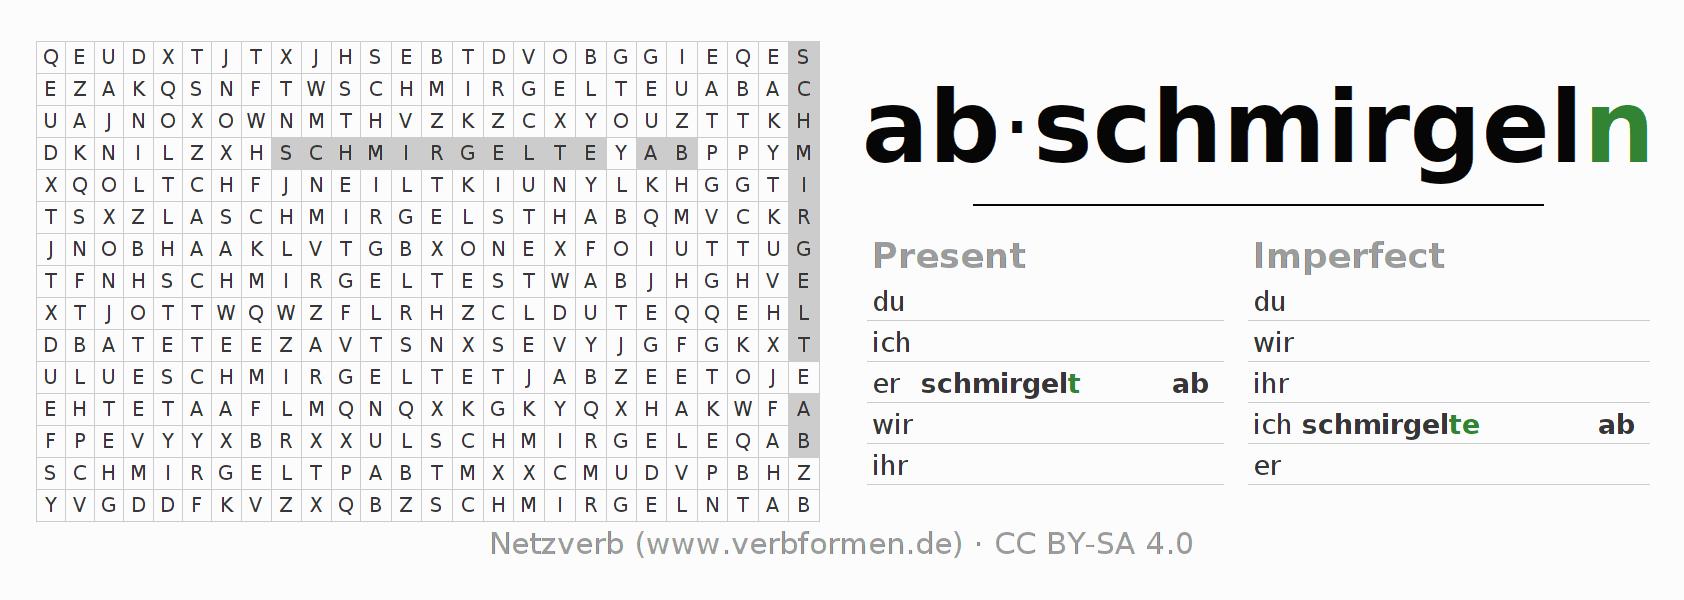 worksheets | verb abschmirgeln | exercises for conjugation of german